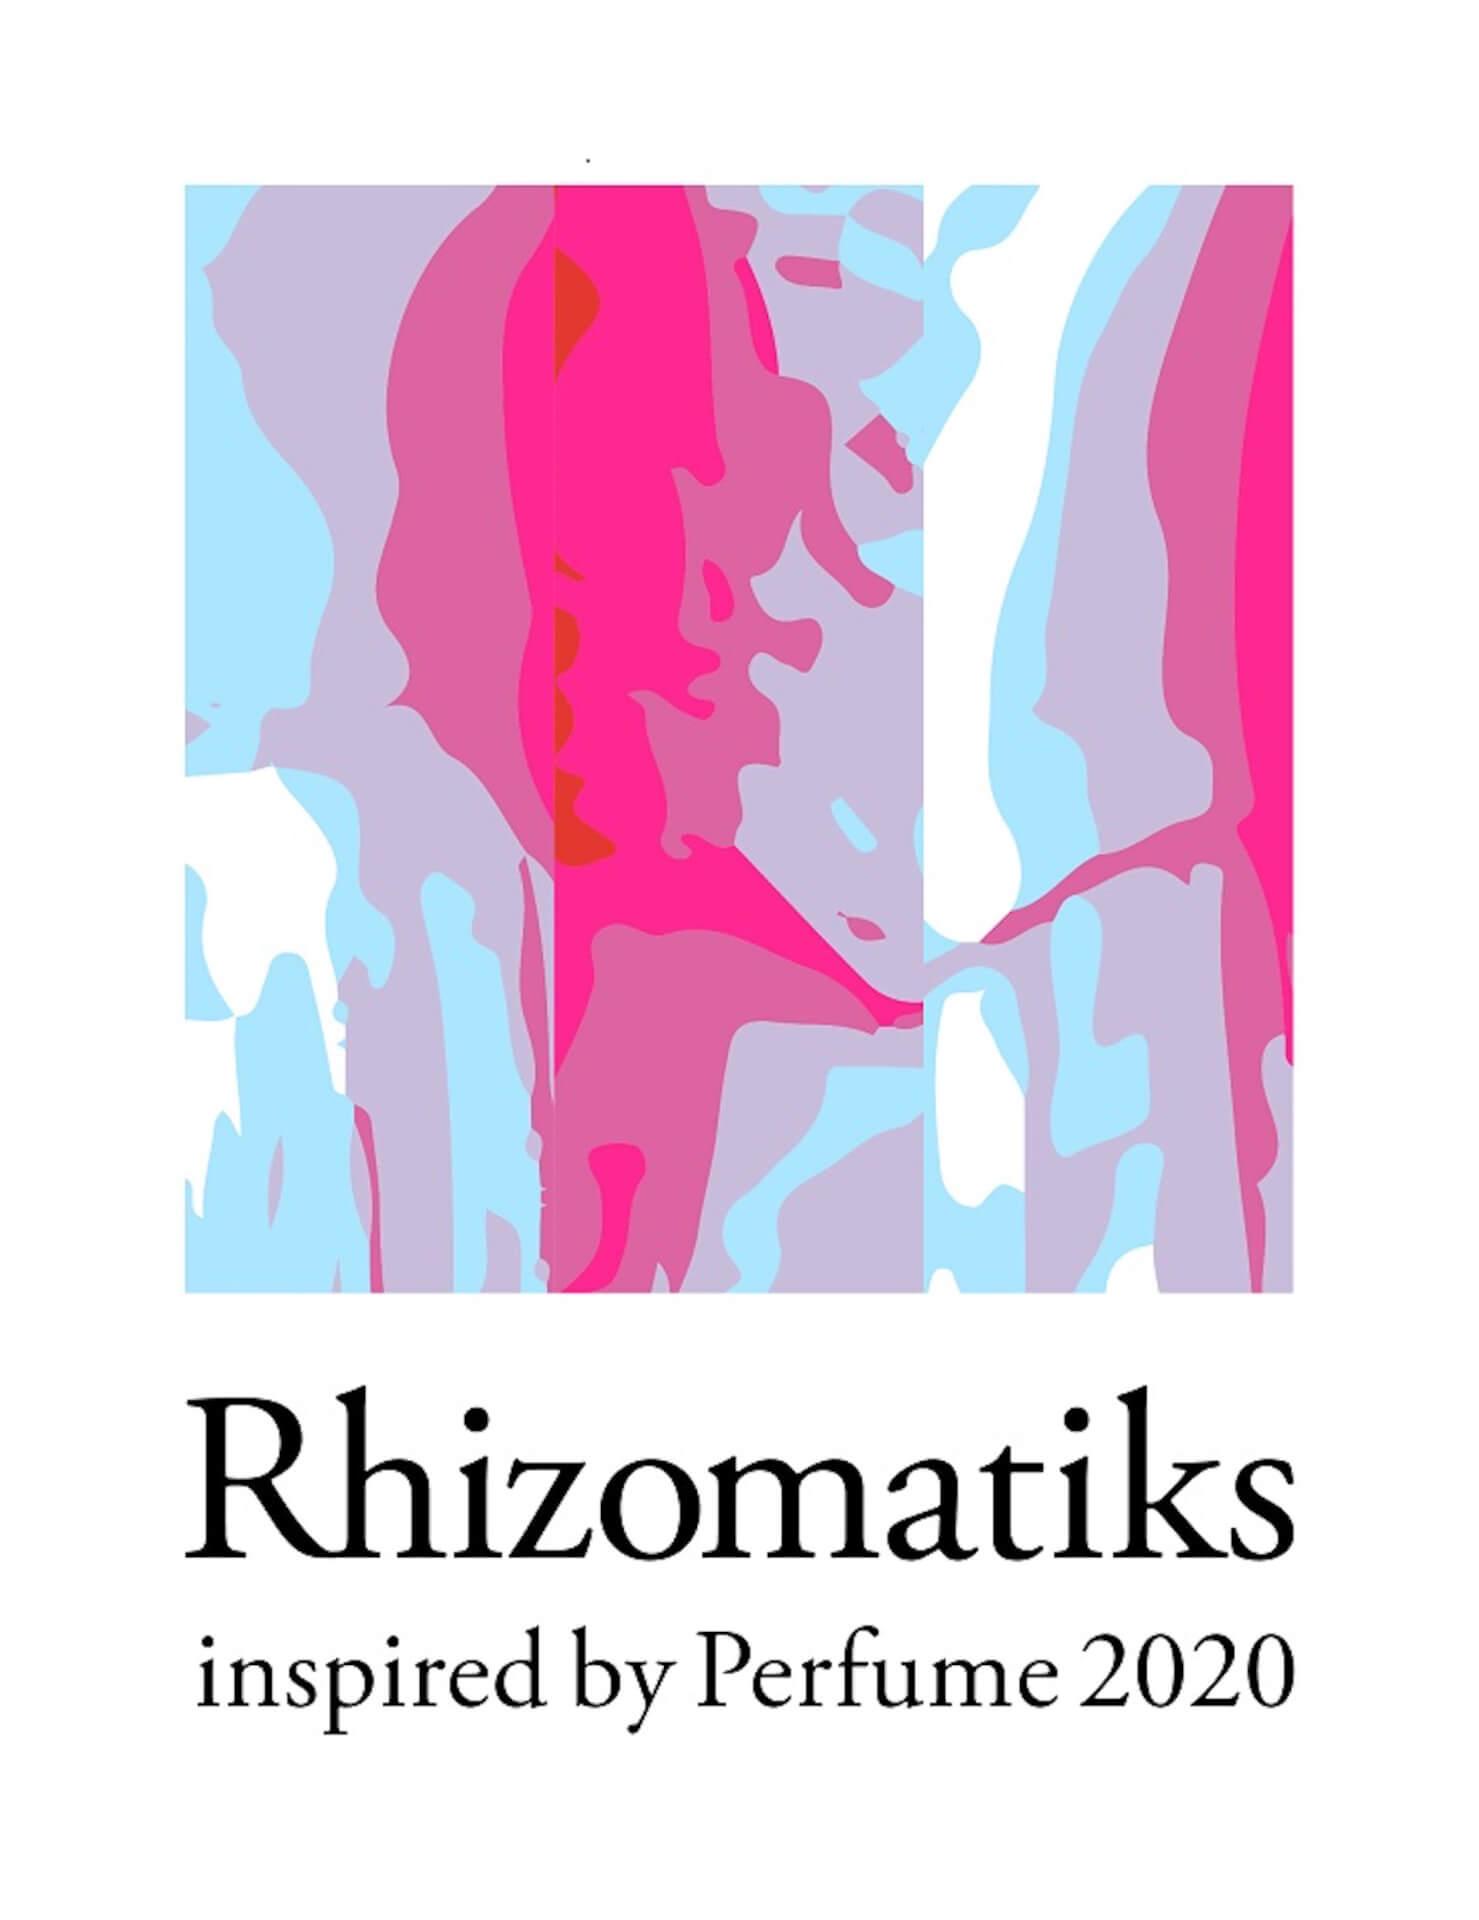 Perfume舞台演出の裏側を体験!<Rhizomatiks inspired by Perfume 2020>が渋谷PARCO MUSEUMで開催! ac200109_rhizomatiksparco_01